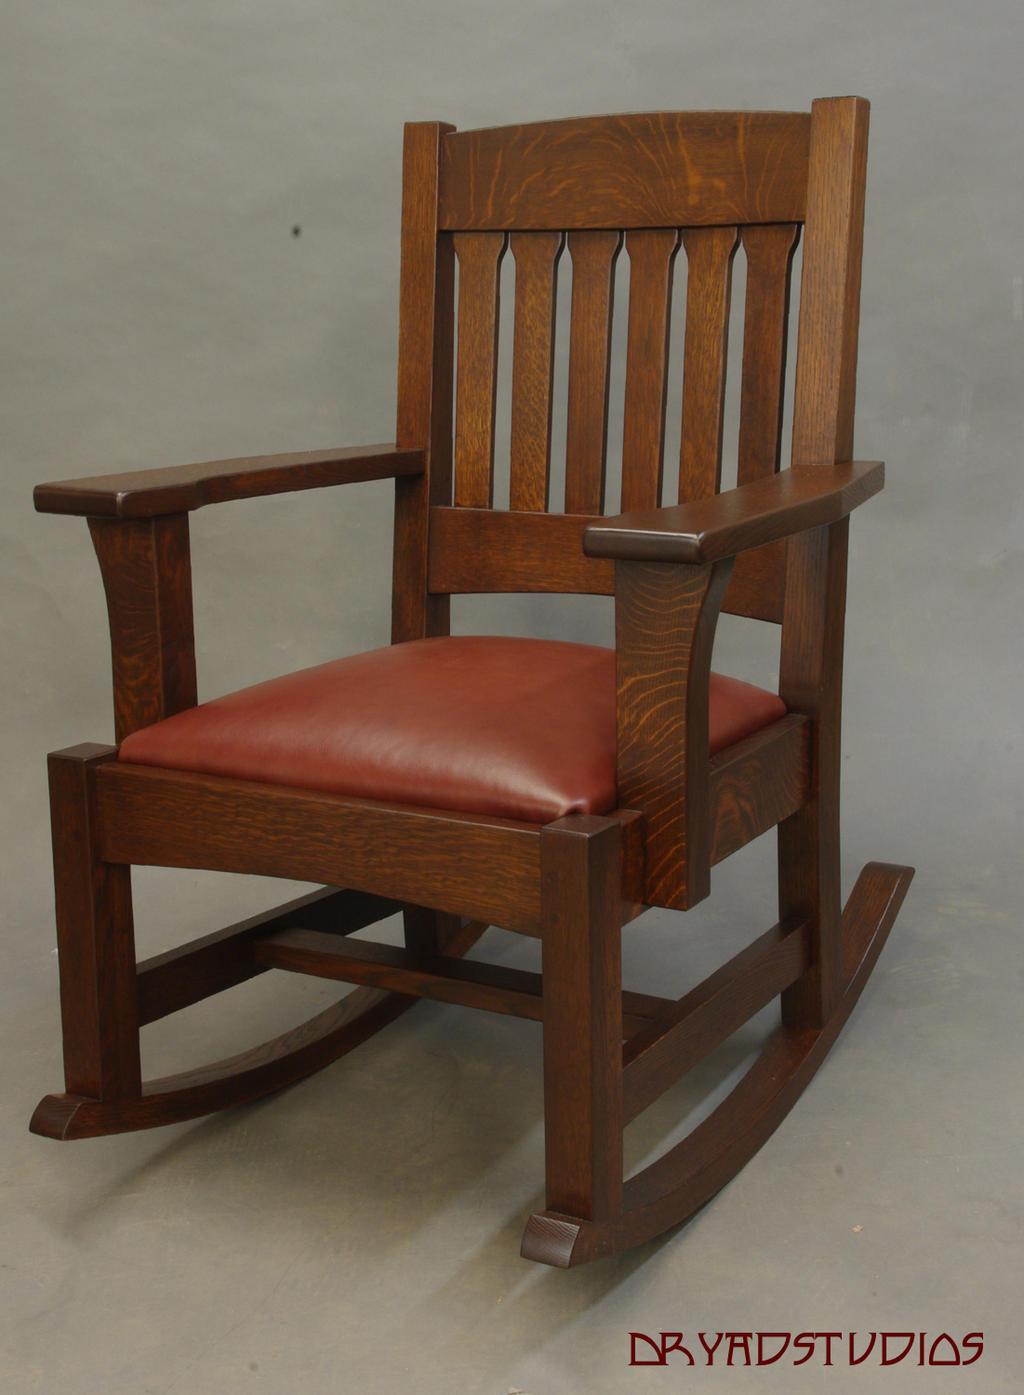 Mission Rocking Chair by DryadStudios on DeviantArt